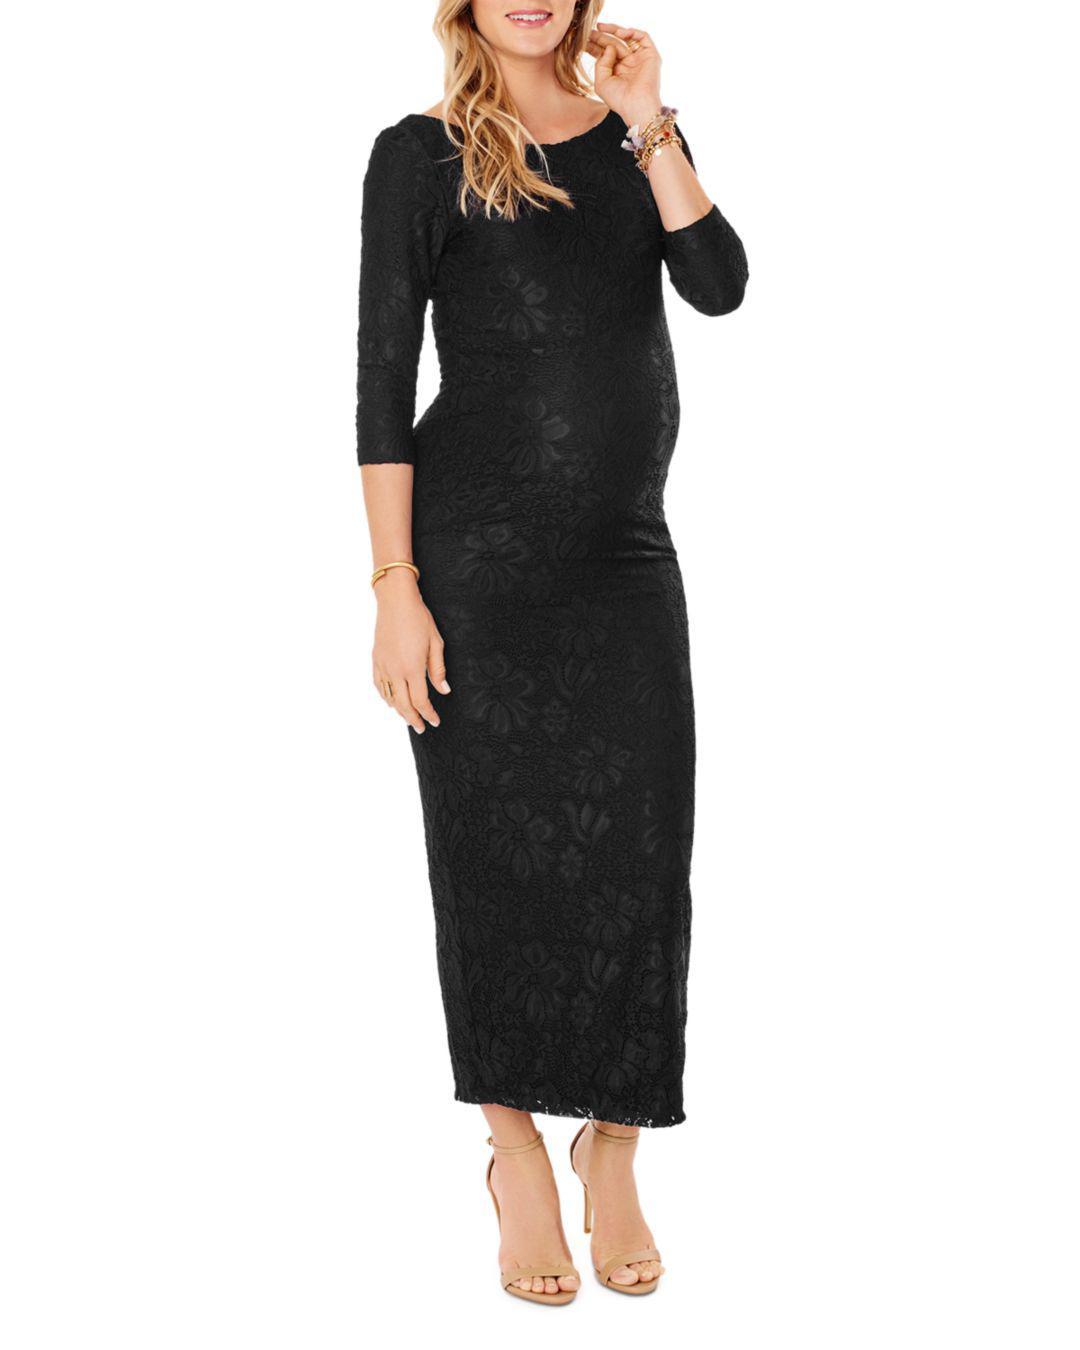 14e1d1b6f7ed Lyst - Ingrid & Isabel Maternity Lace Boatneck Maxi Dress in Black